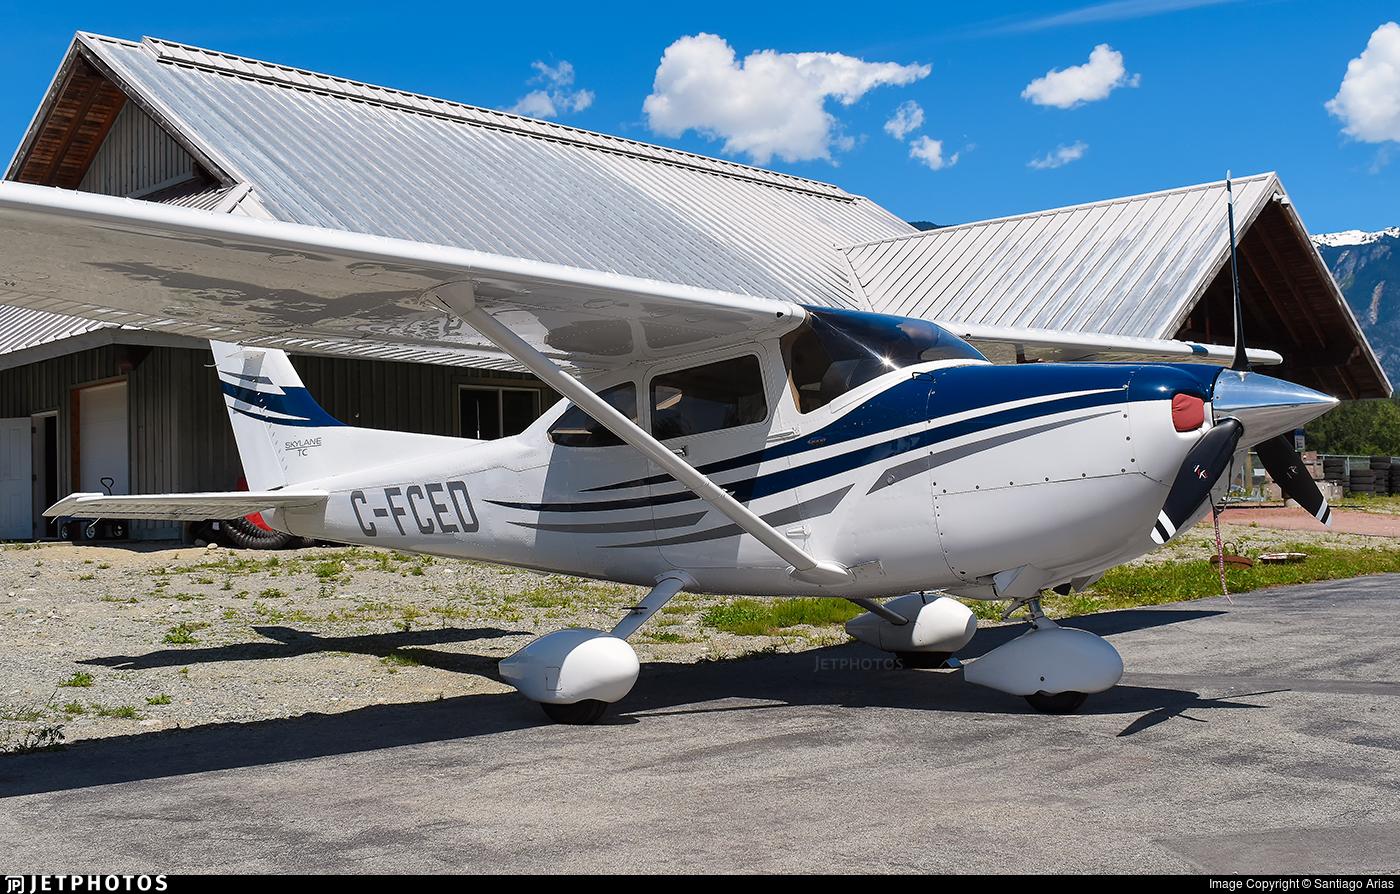 C-FCED - Cessna T182T Turbo Skylane - Private